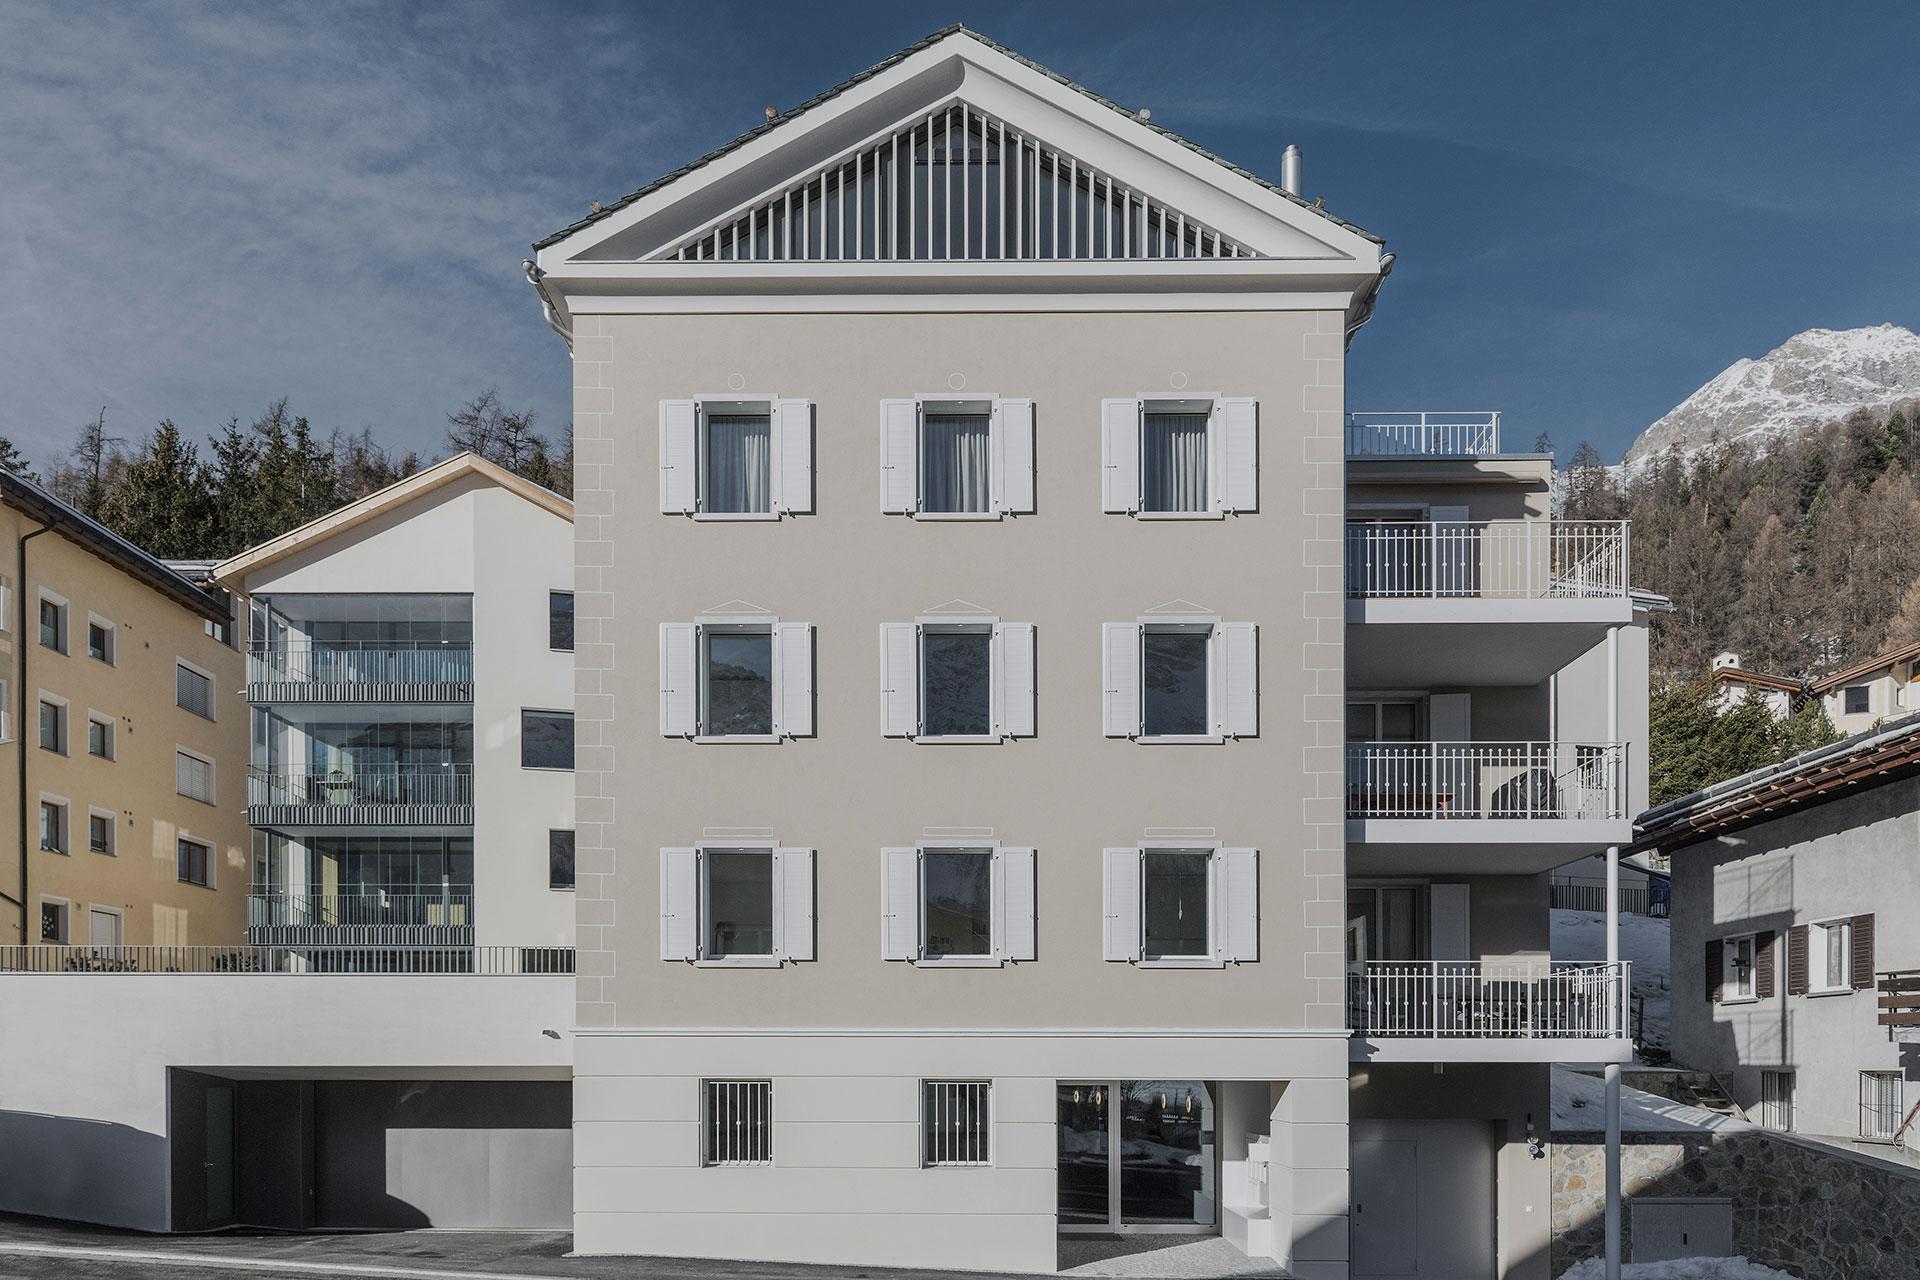 Home fh architektur bever engadin st moritz for Fachhochschule architektur